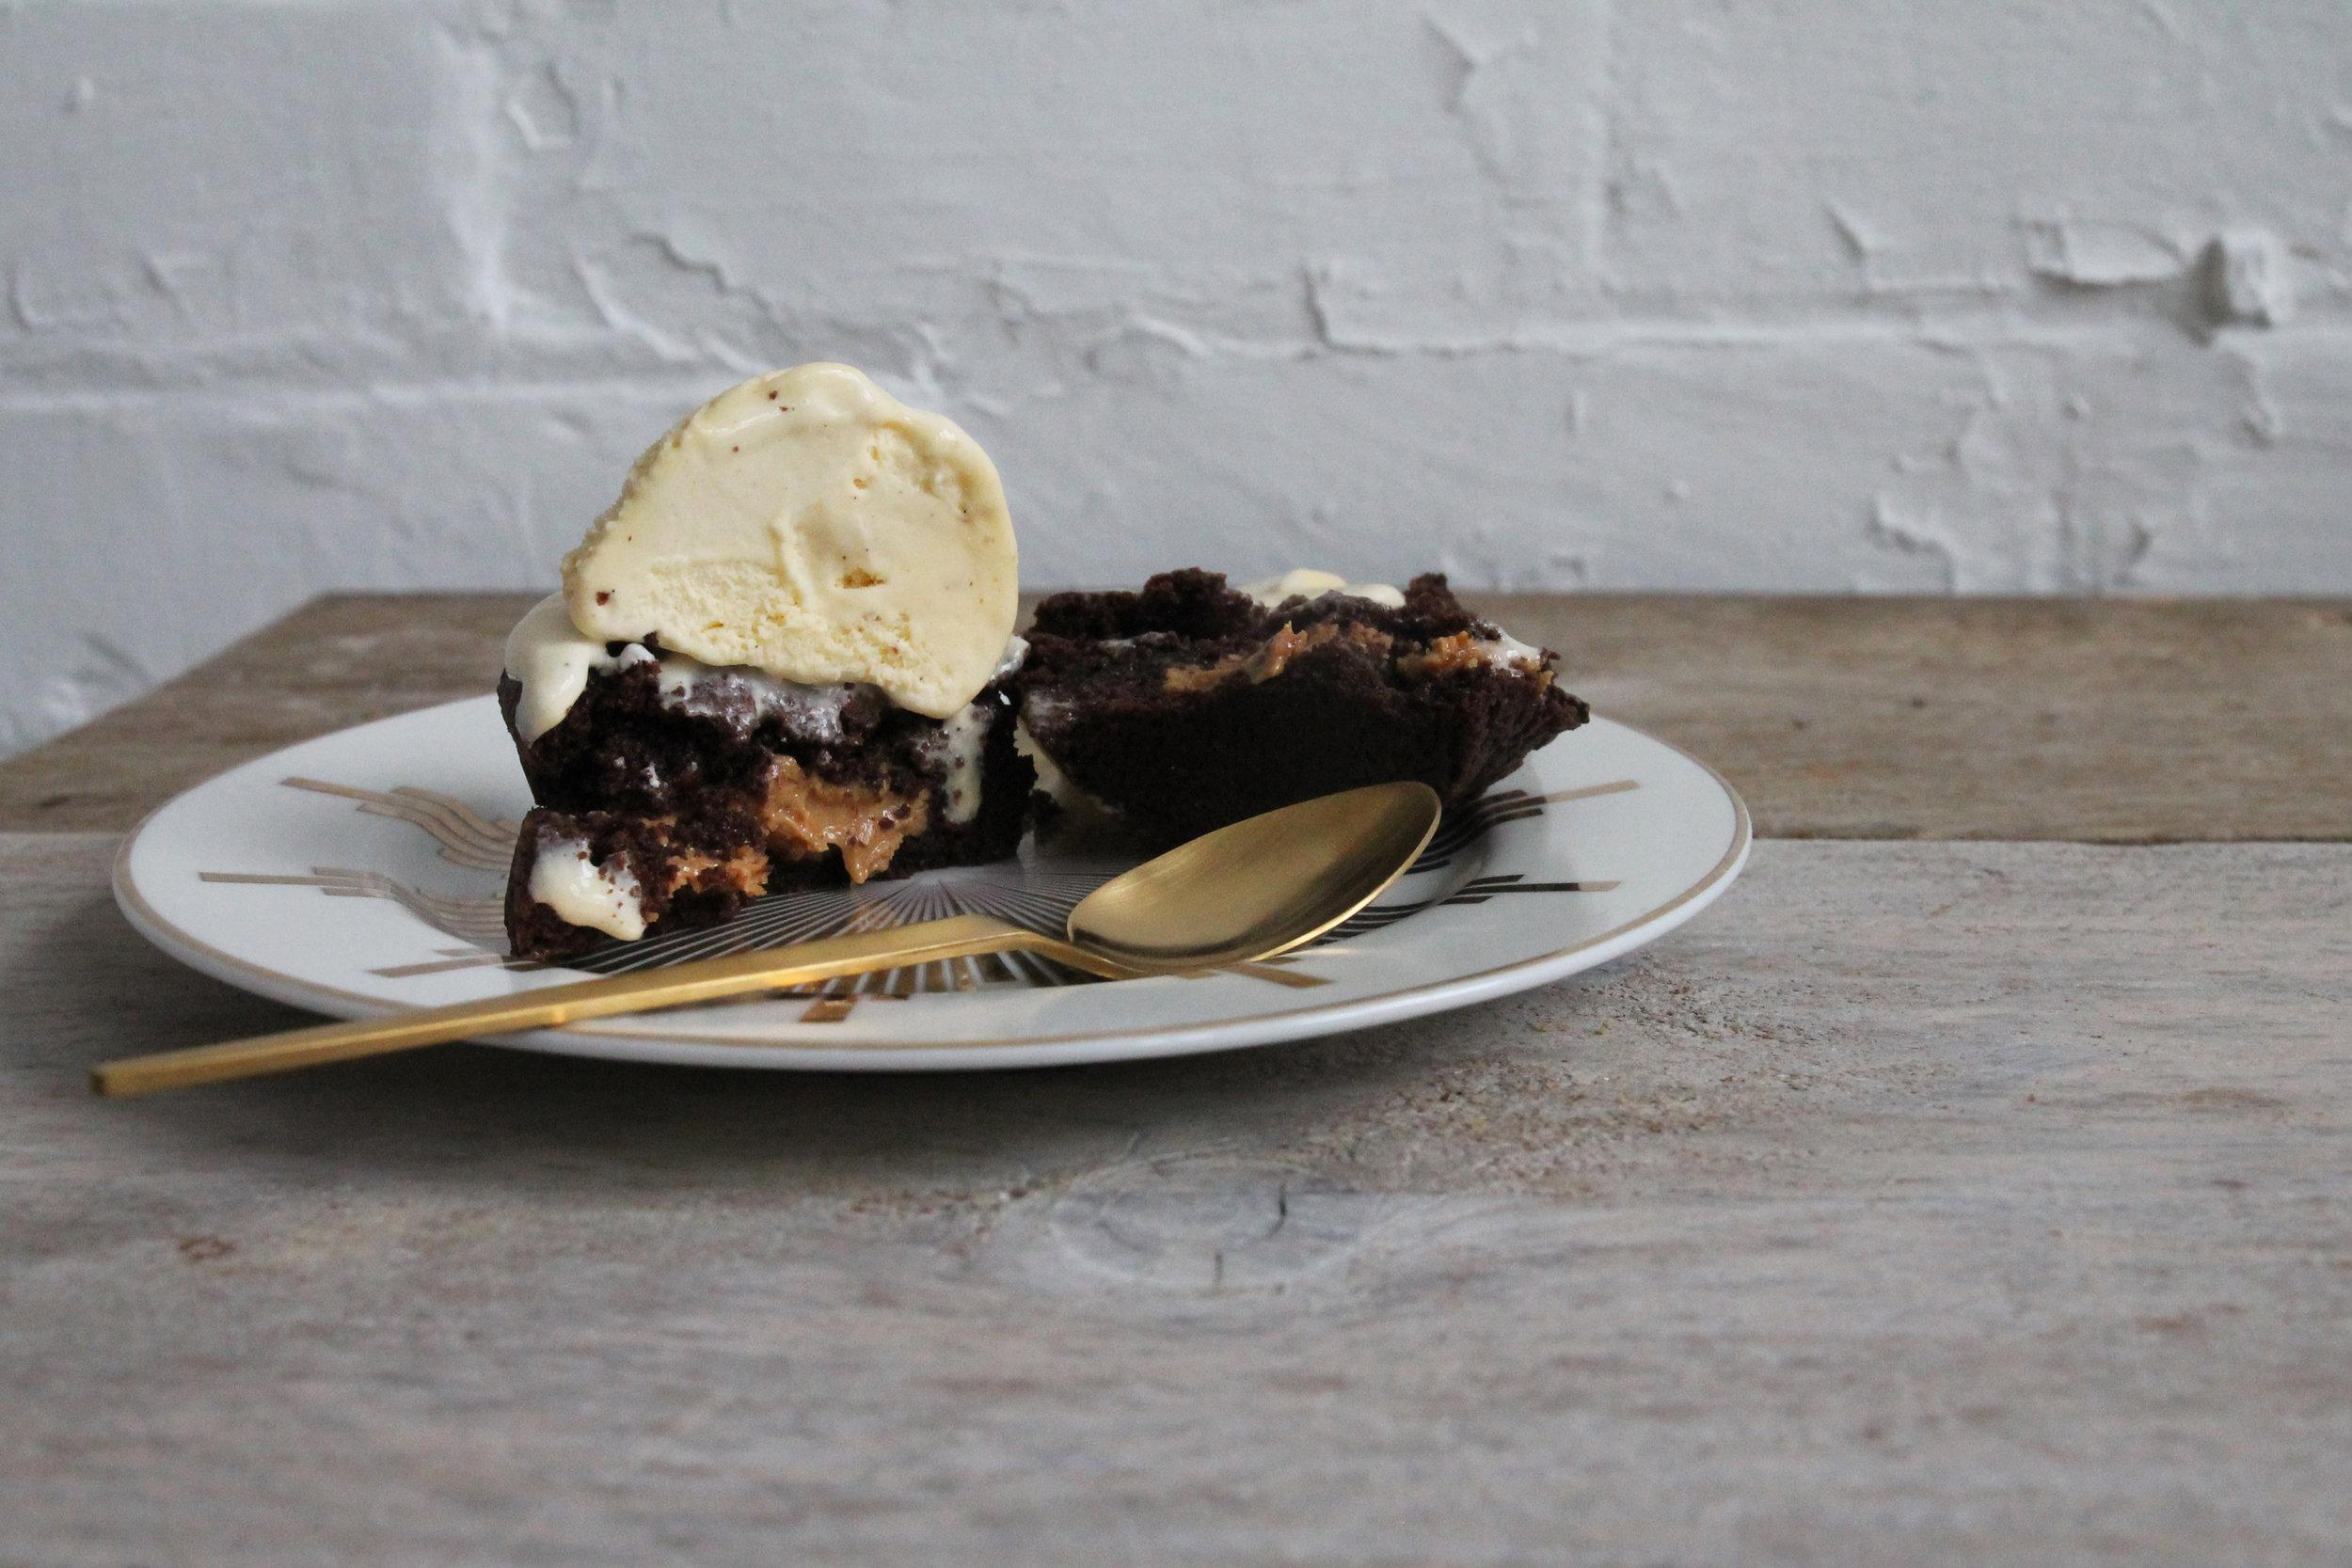 Cookie and ice cream dessert ideas